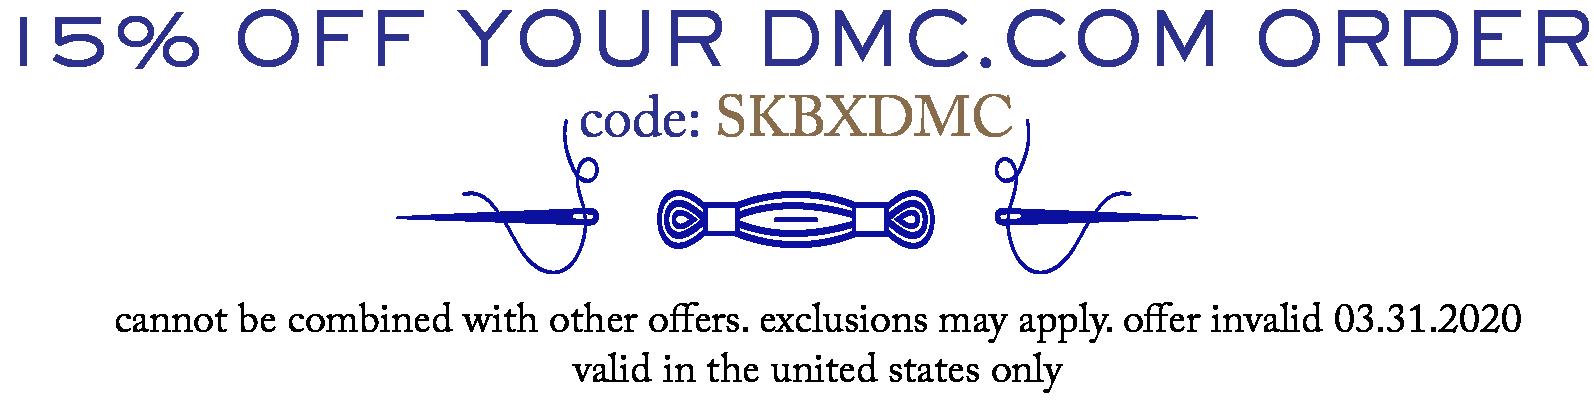 DMC Coupon Code Handout Drop in.png